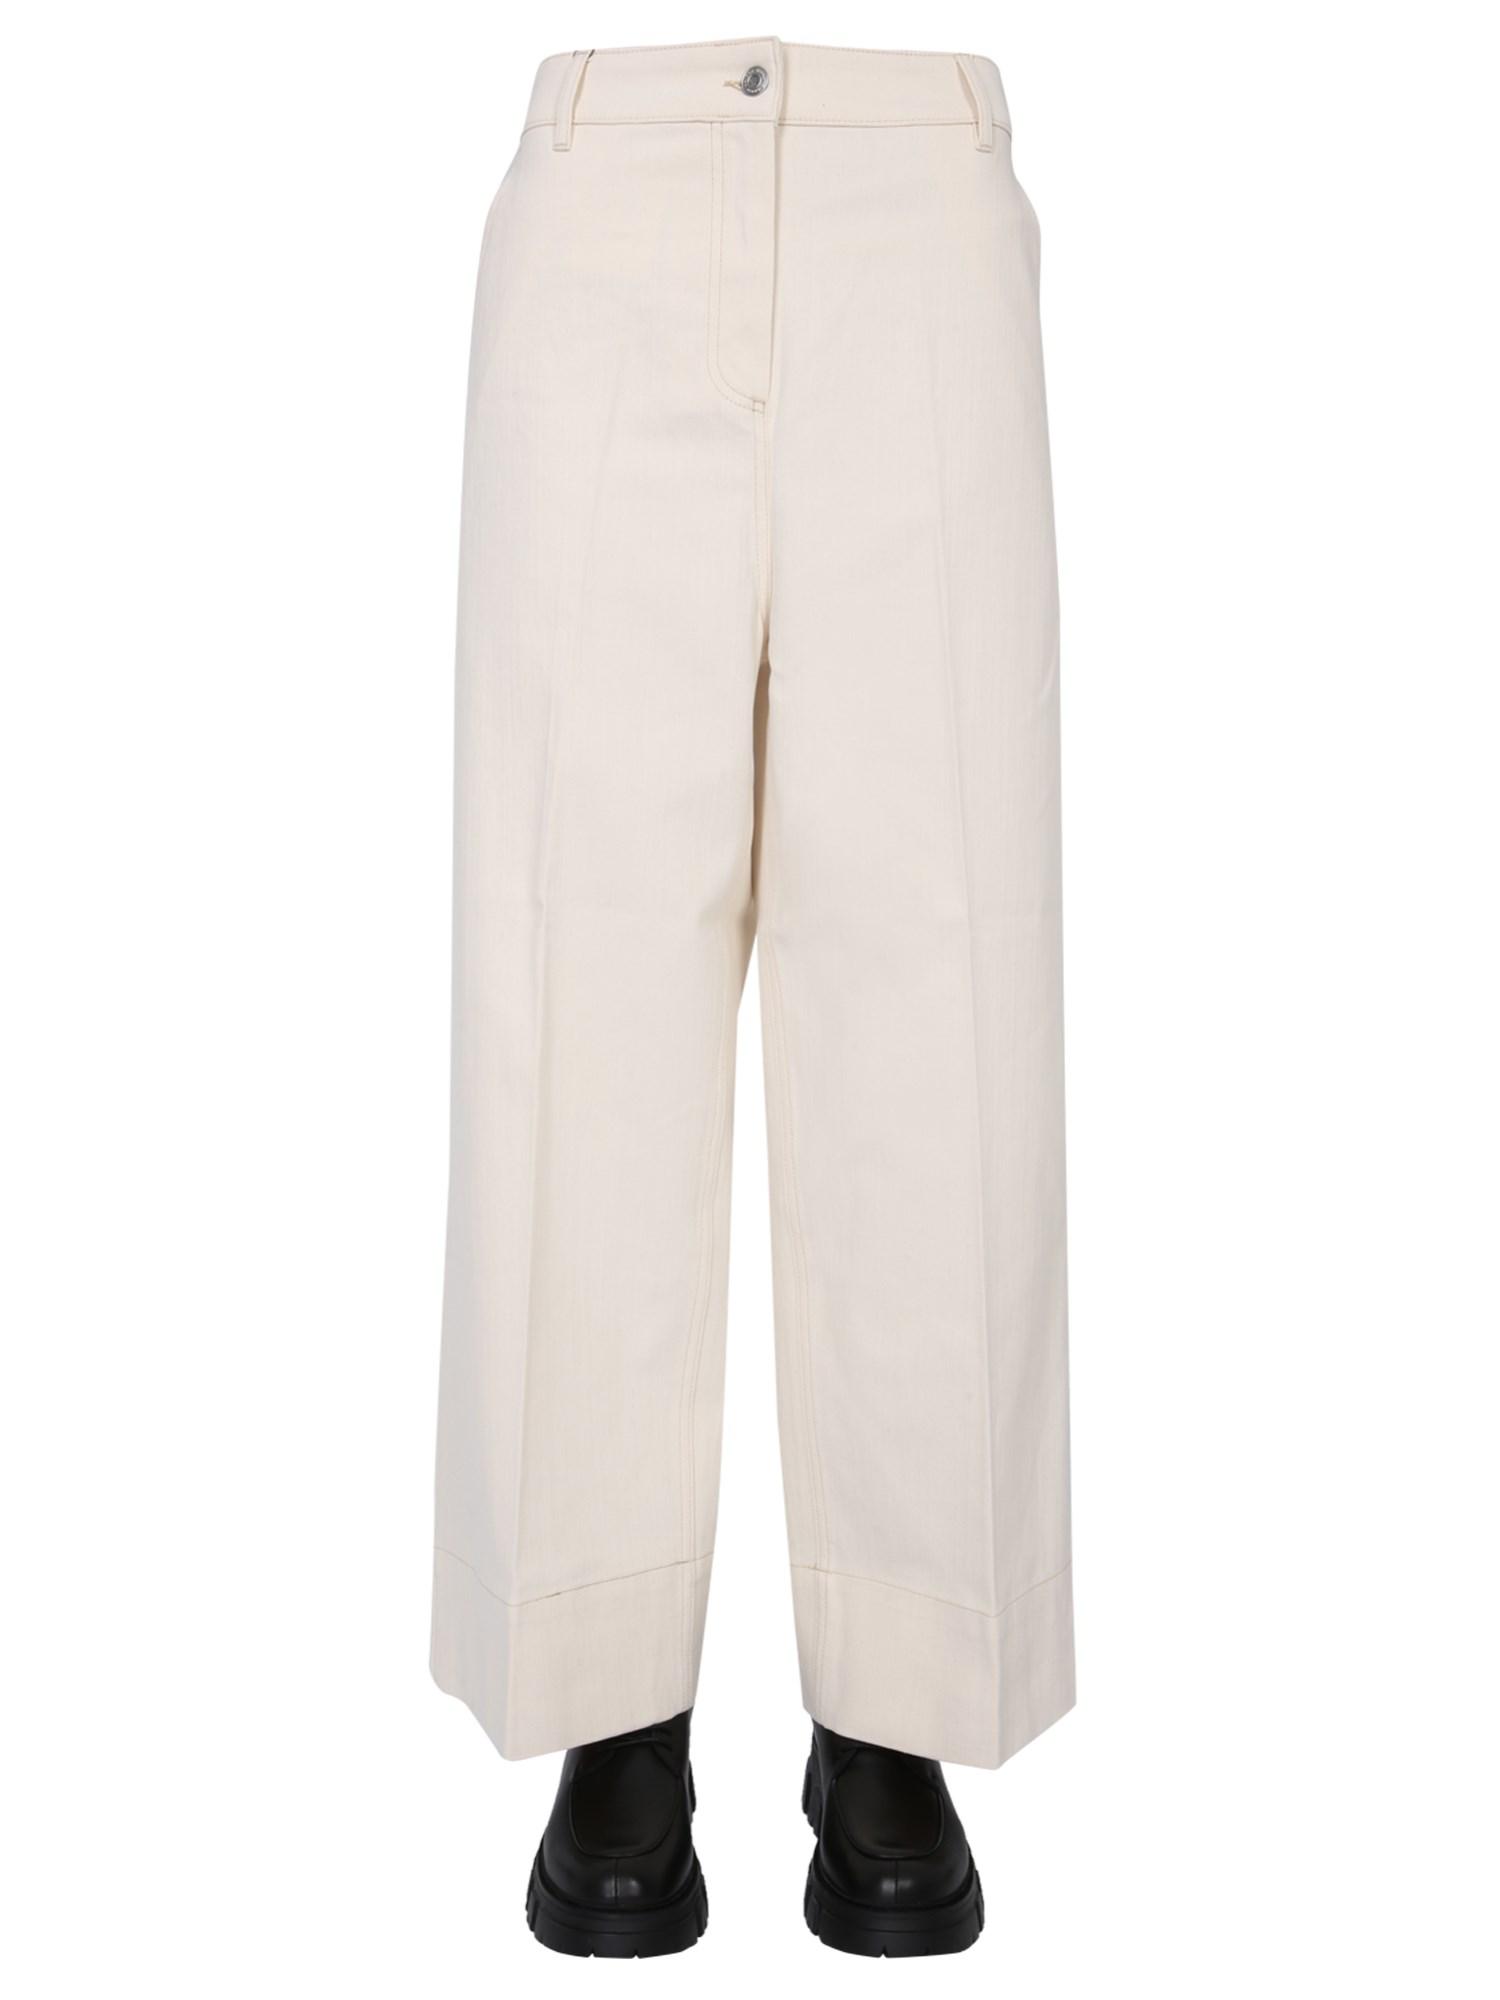 Maison kitsuné high waist jeans - maison kitsuné - Modalova